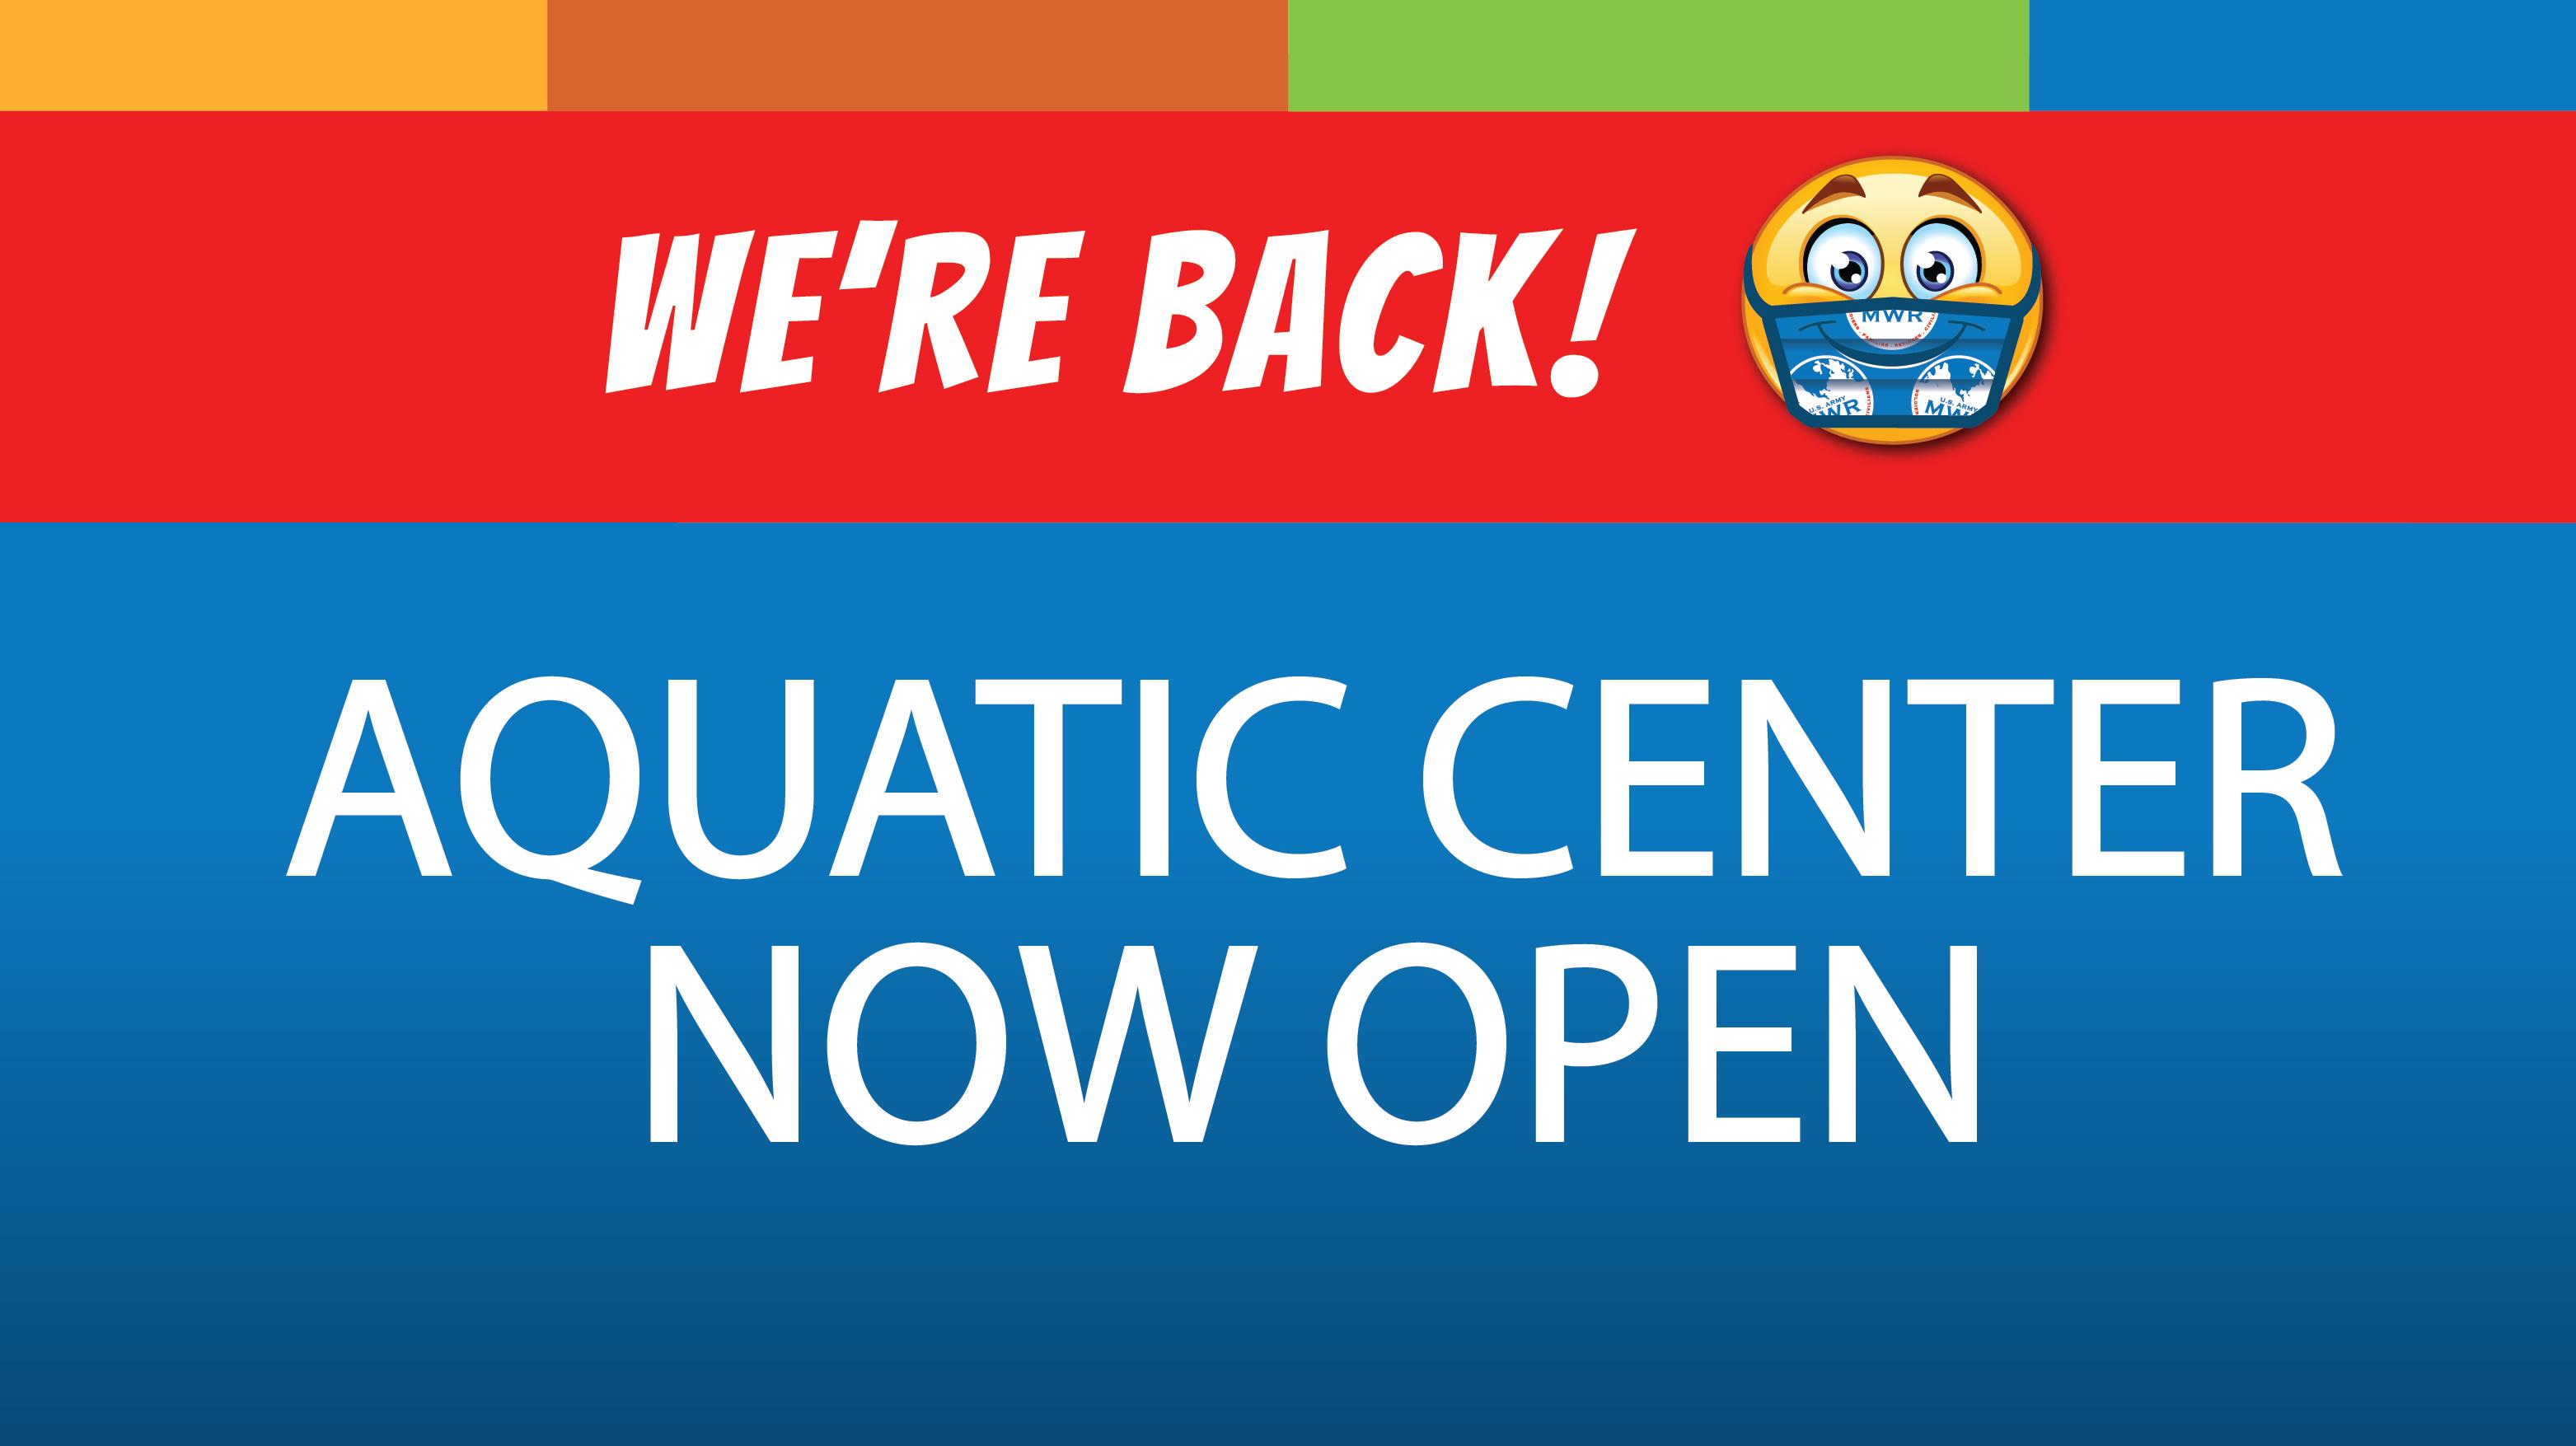 Aquatic Center Now Open